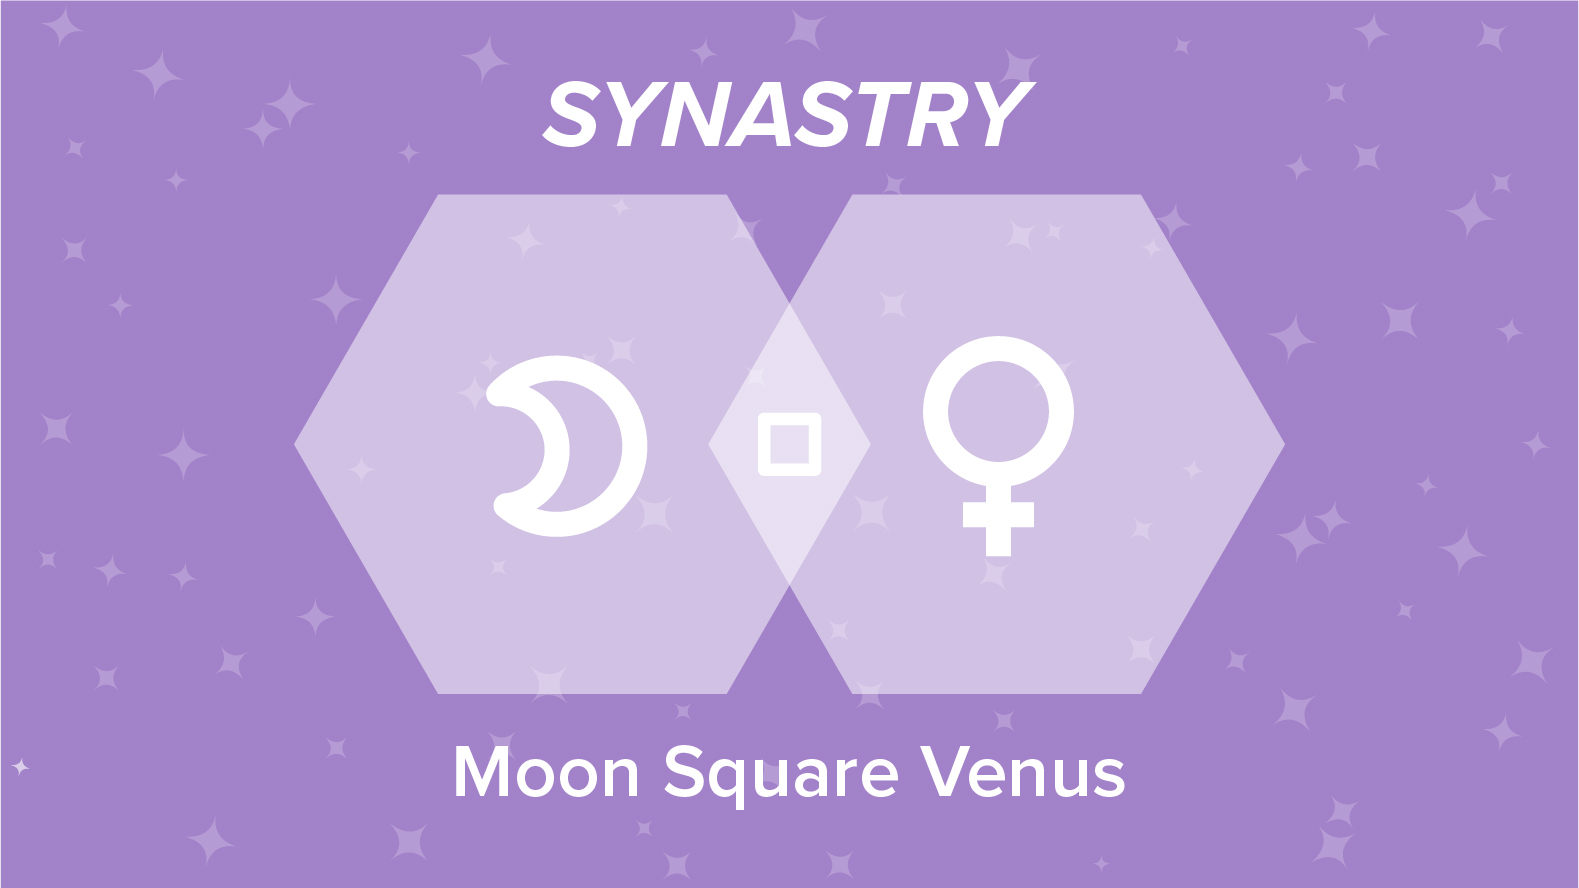 Moon Square Venus Synastry